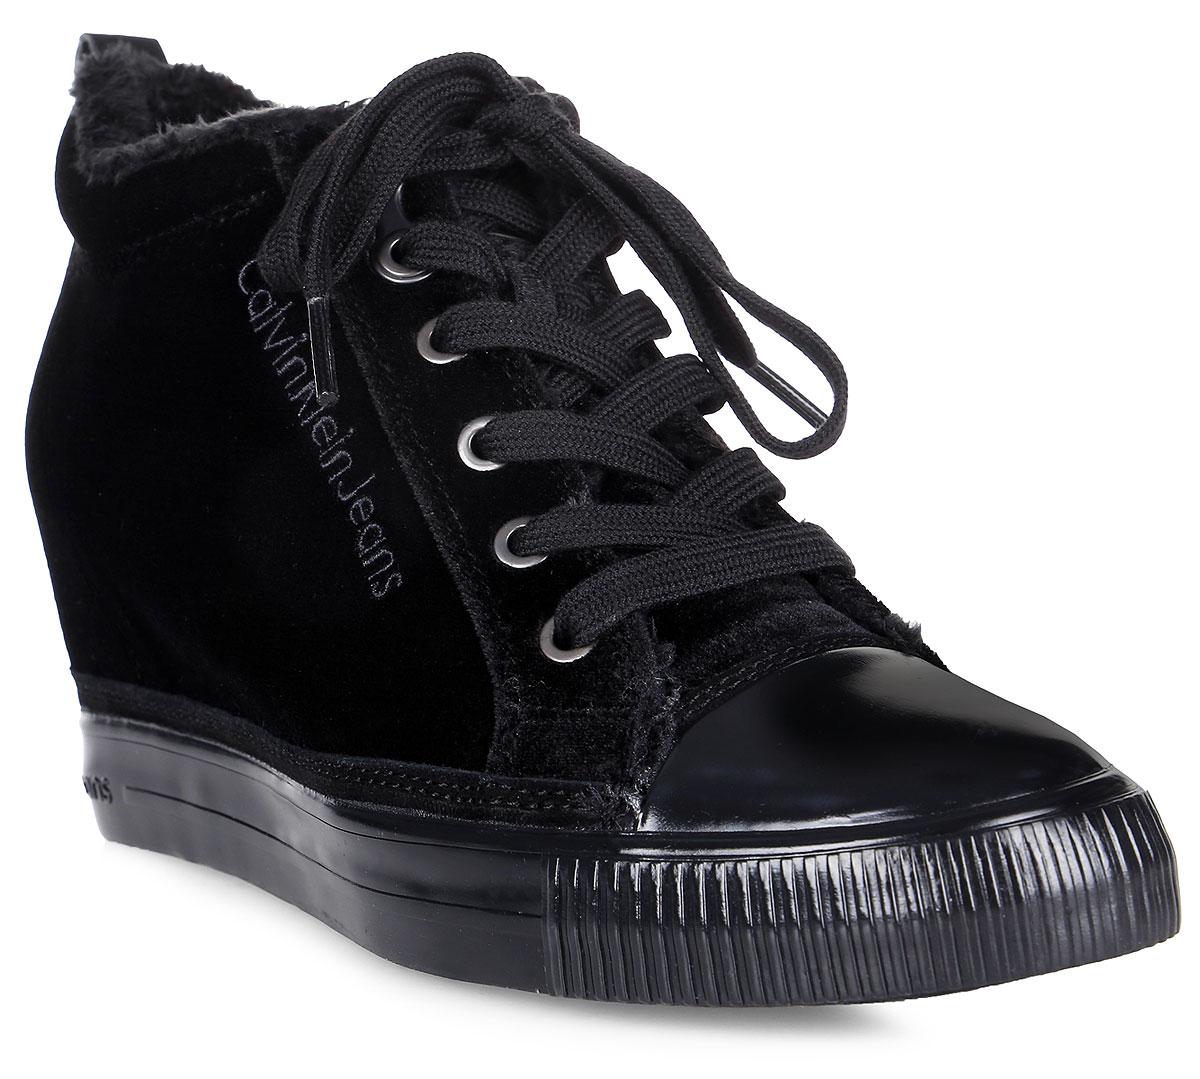 Сникеры женские Calvin Klein Jeans, цвет: черный. R0530. Размер 39